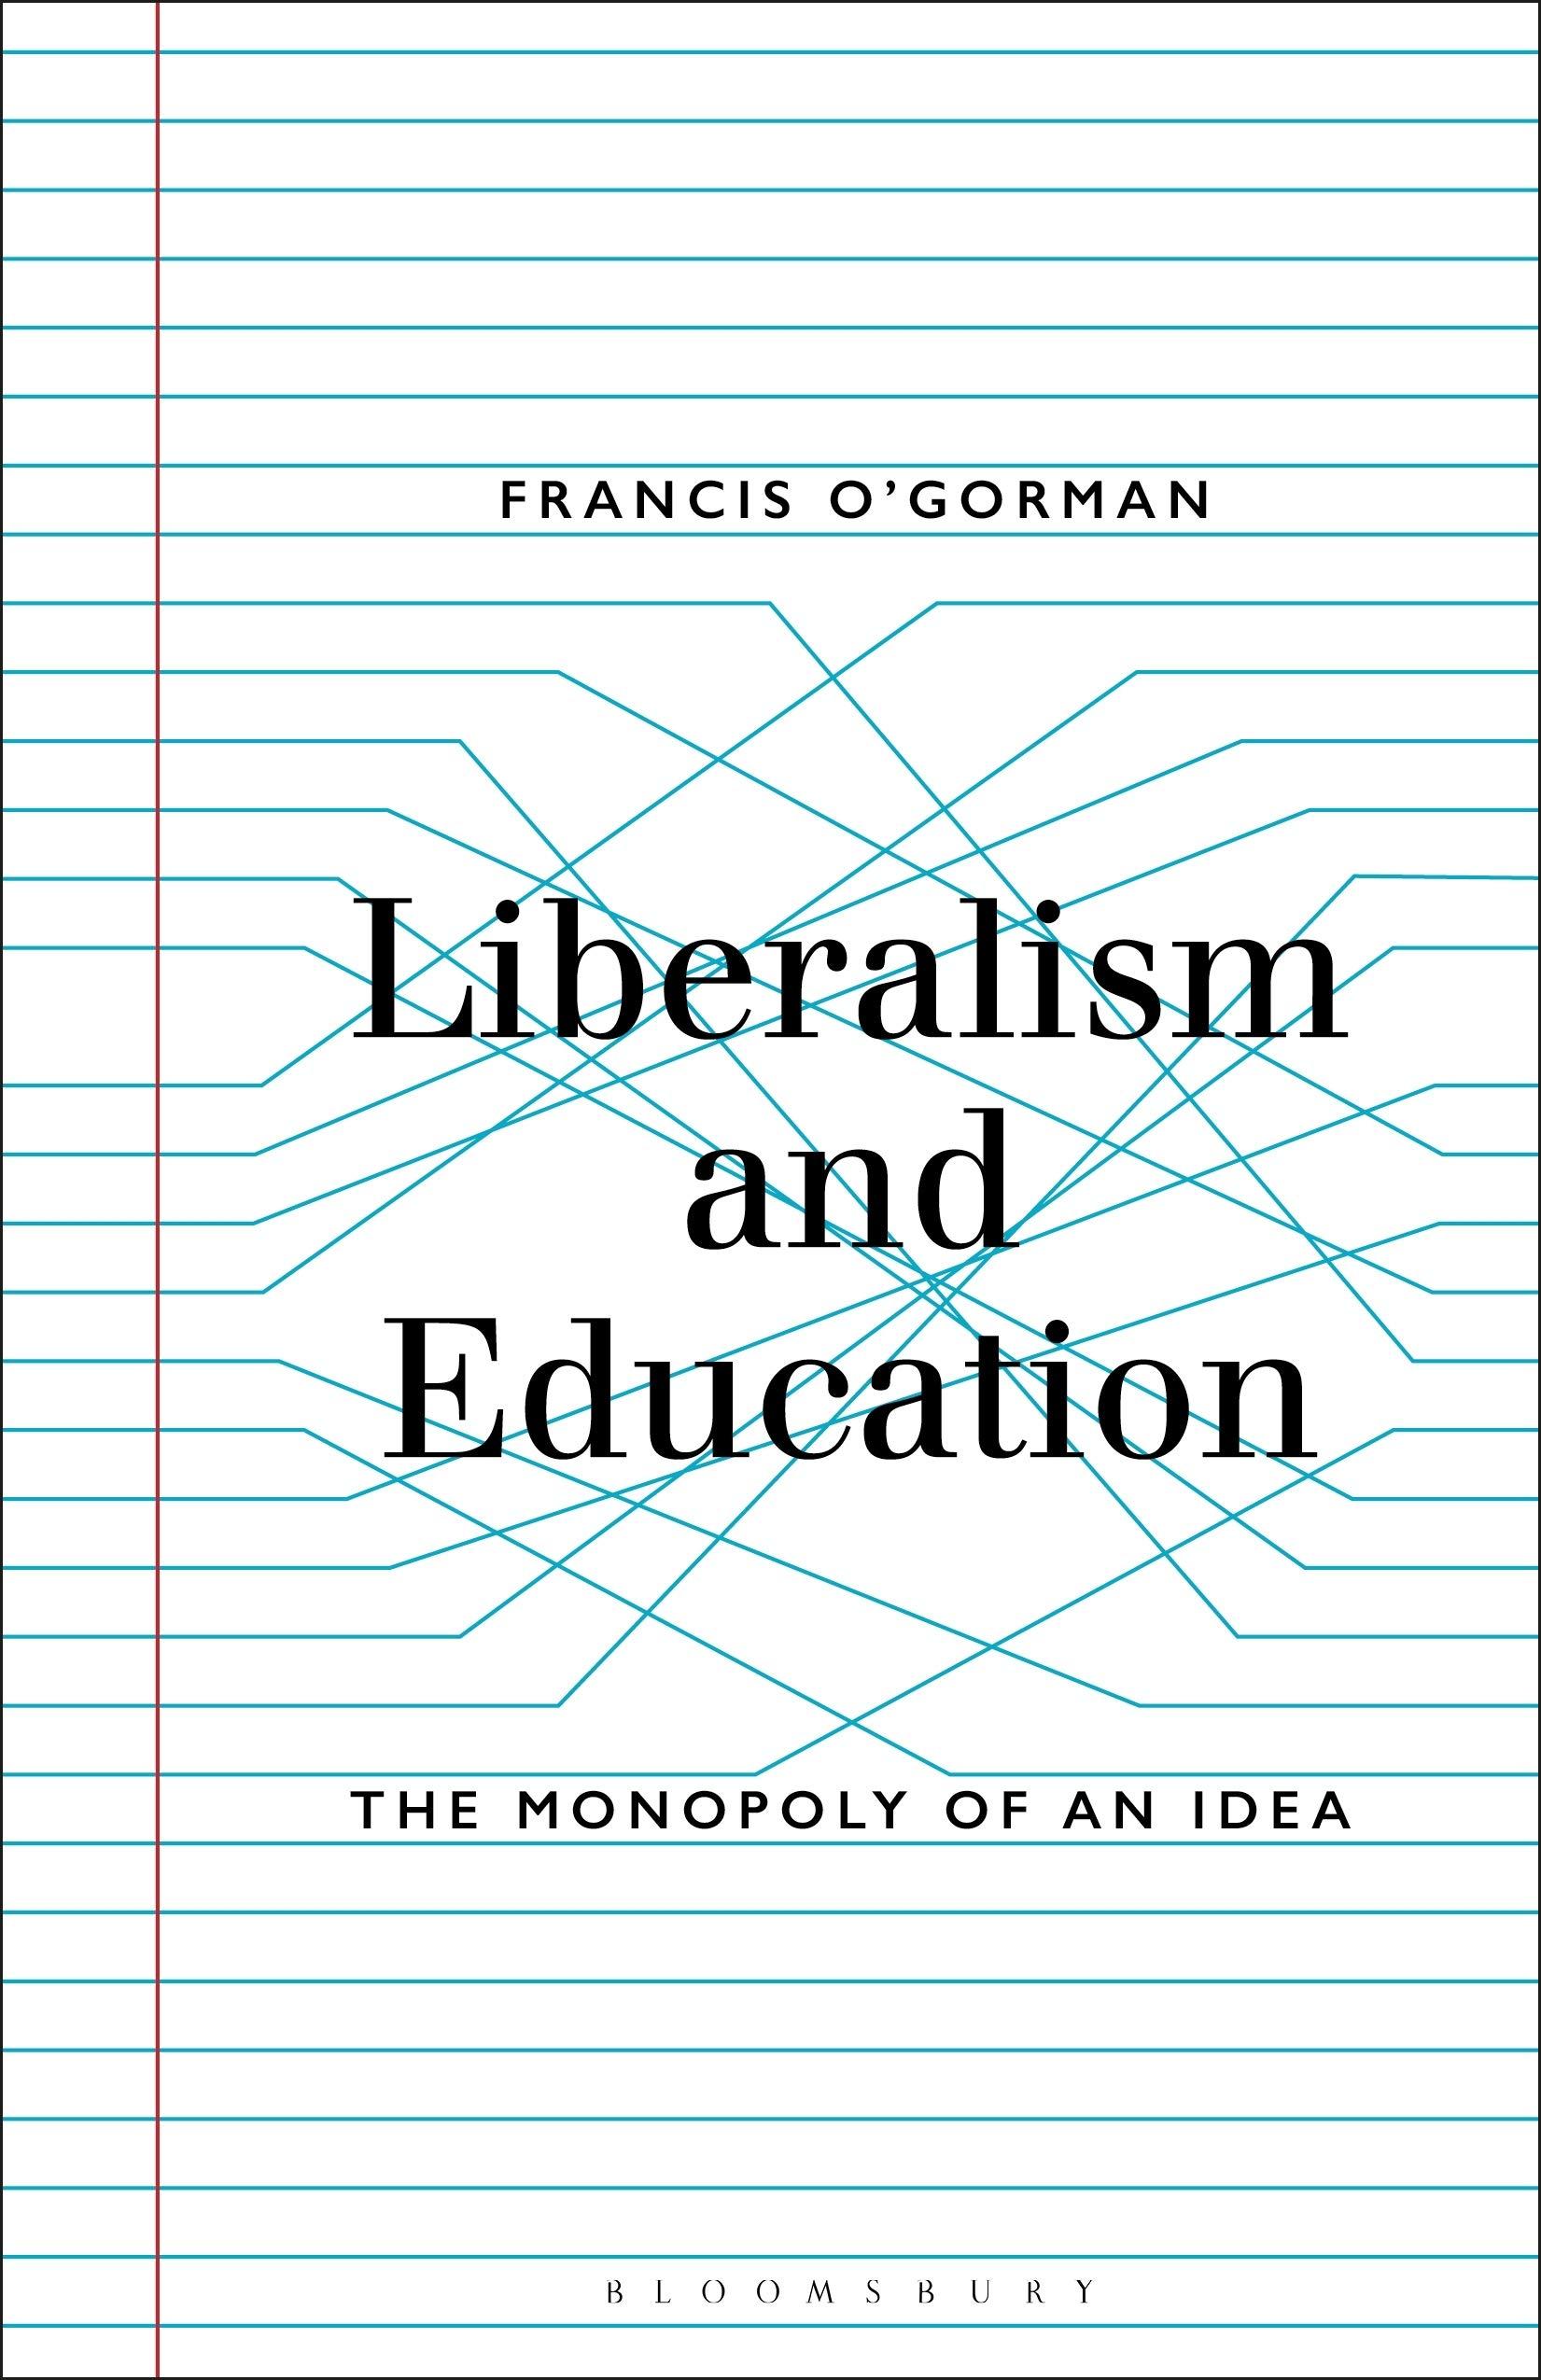 Liberalism and Education: The Monopoly of an Idea: Amazon.es: OGorman, Francis: Libros en idiomas extranjeros